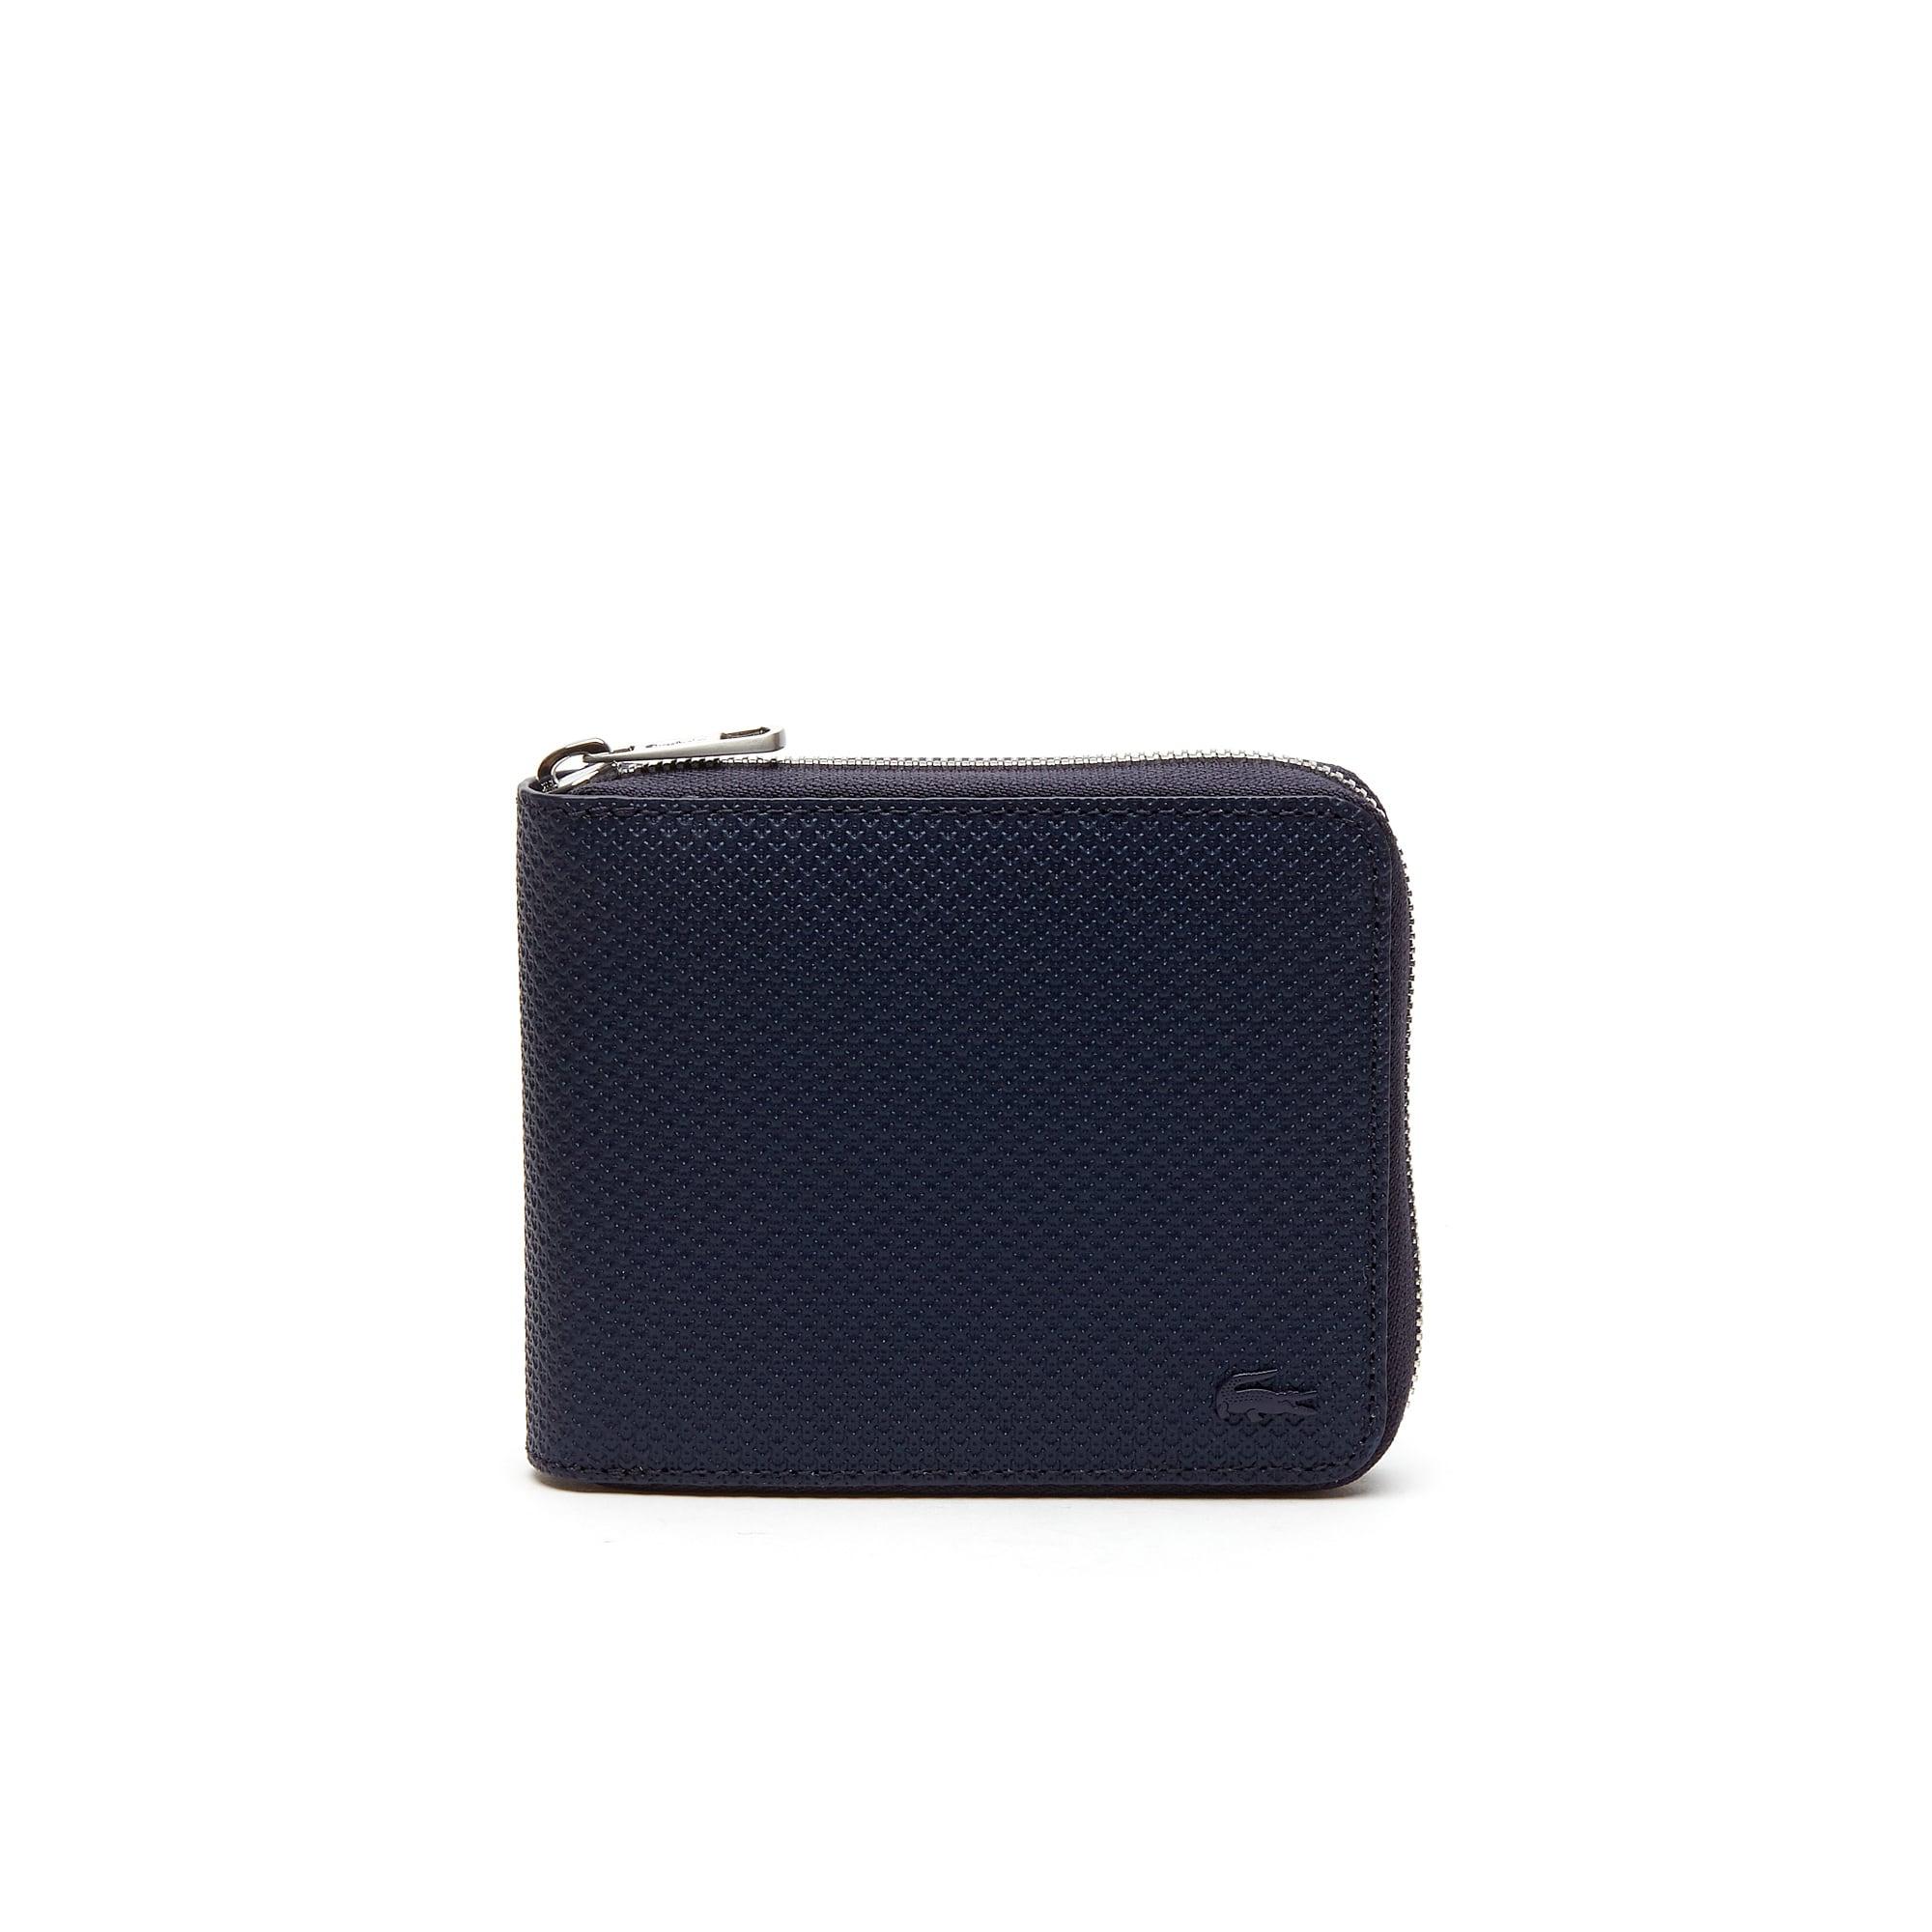 Men's Chantaco Piqué Leather 8 Card Zip Wallet